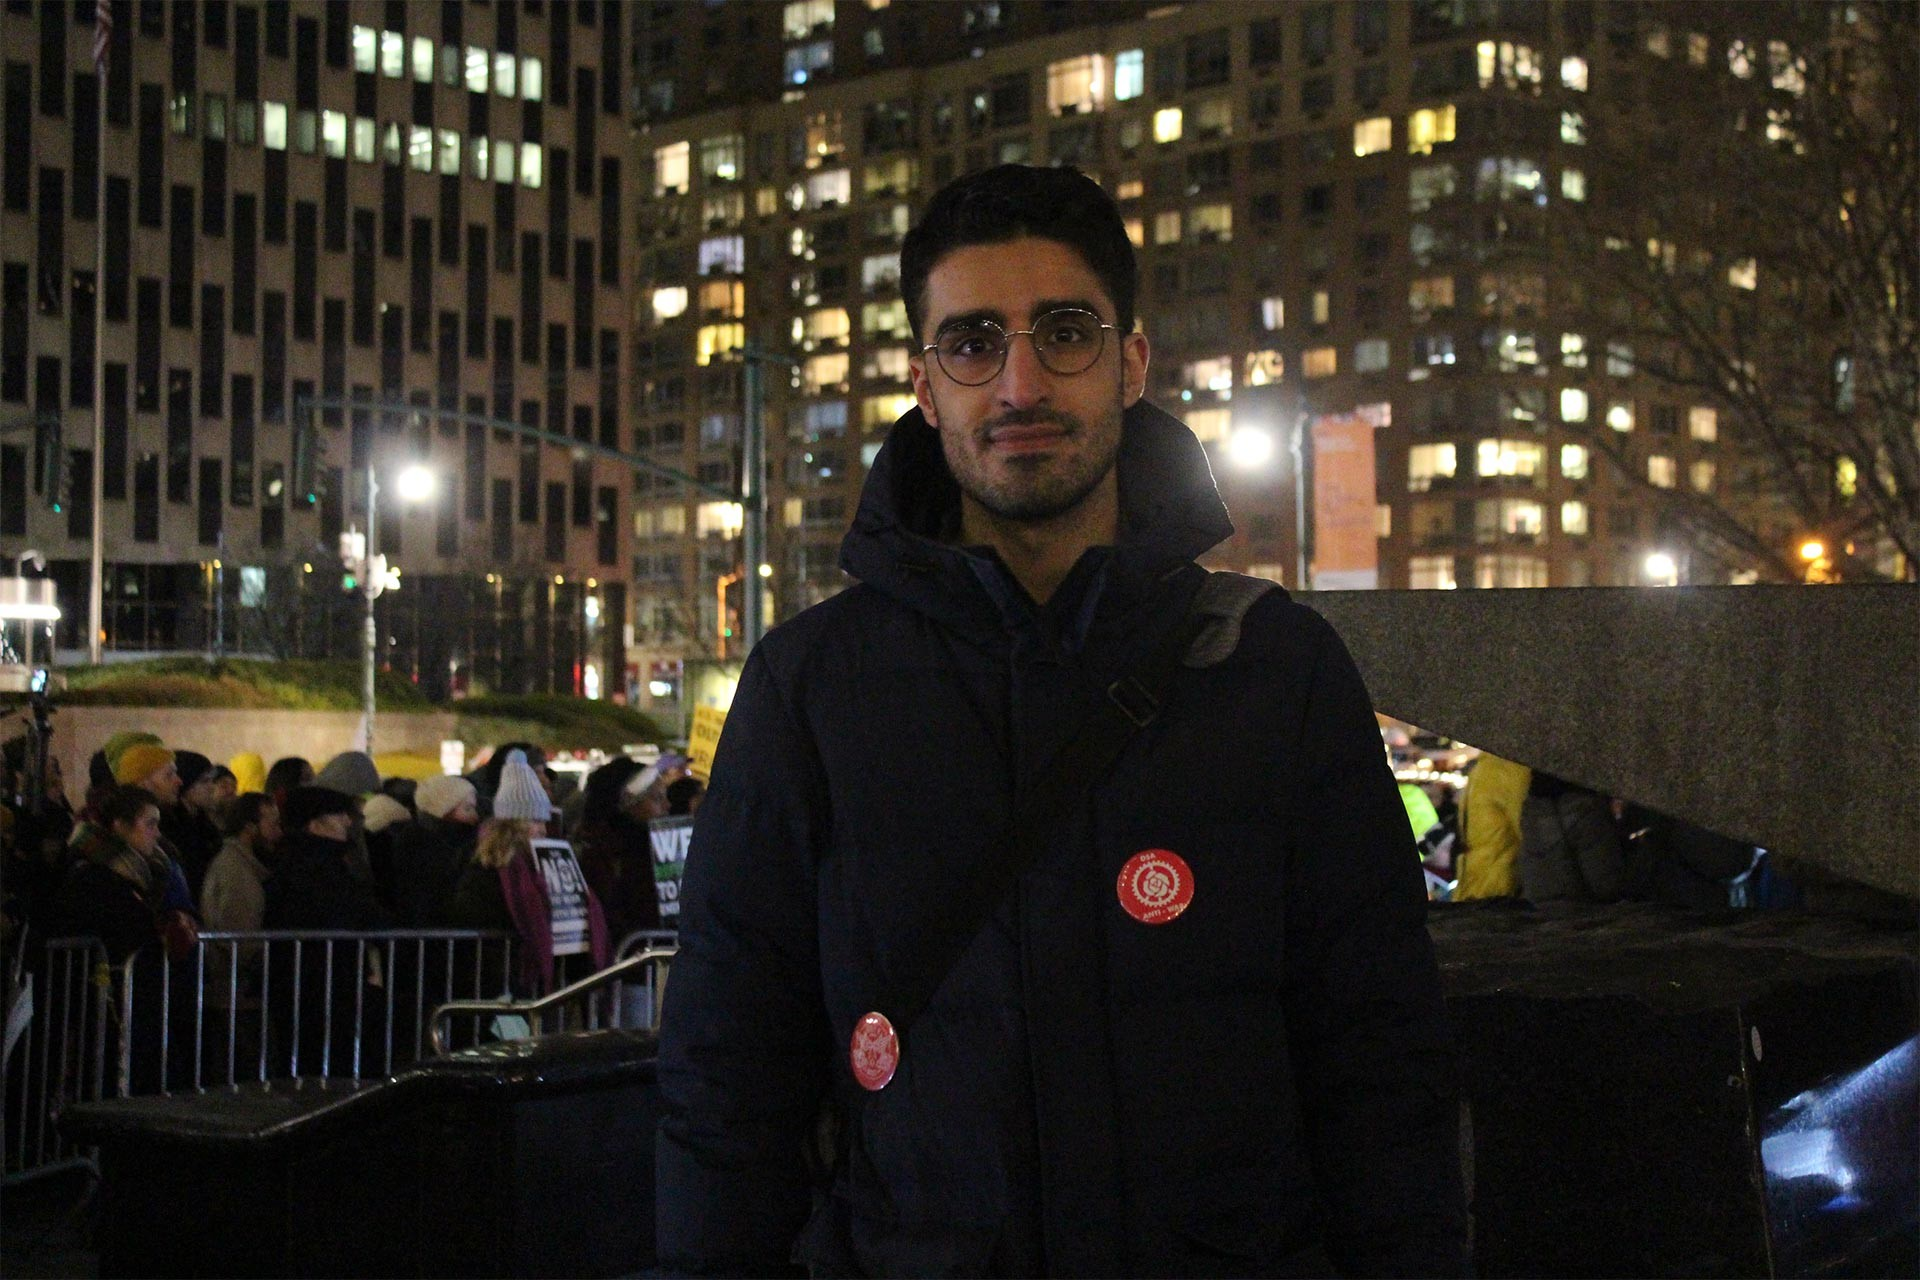 Savaş Karşıtı Çalışma Grubu'ndan Sepehr Makaremi